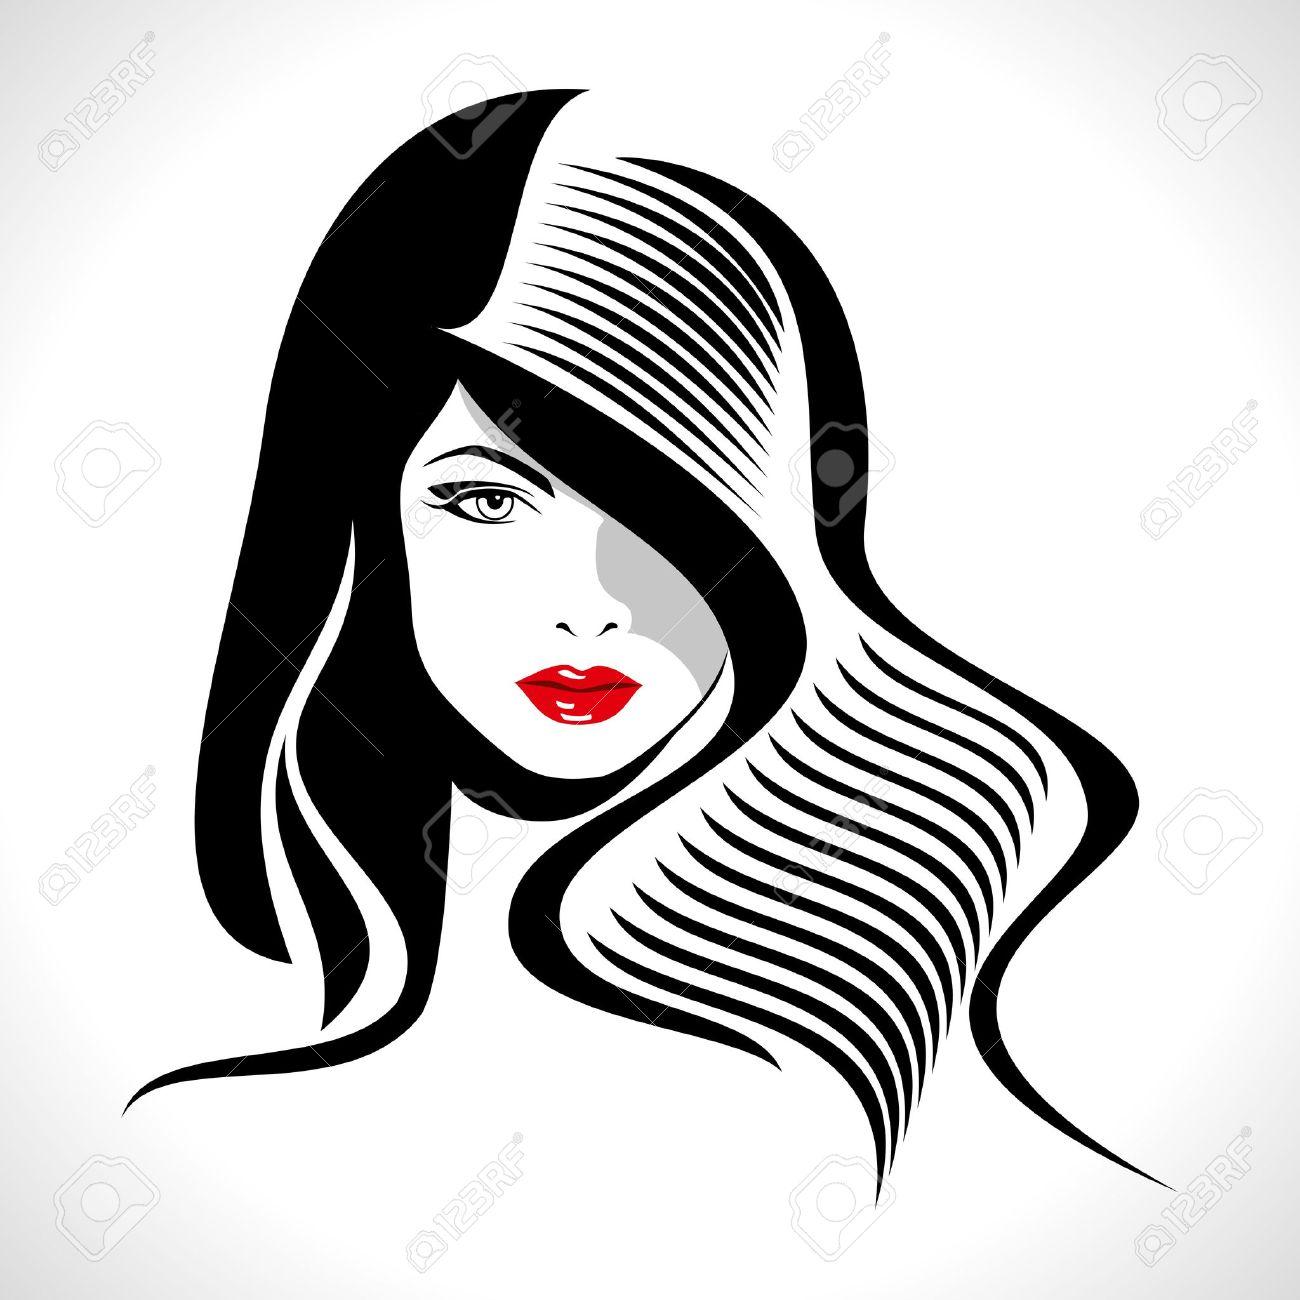 Hair clipart women's hair Vector 18173293  Panda Clipart